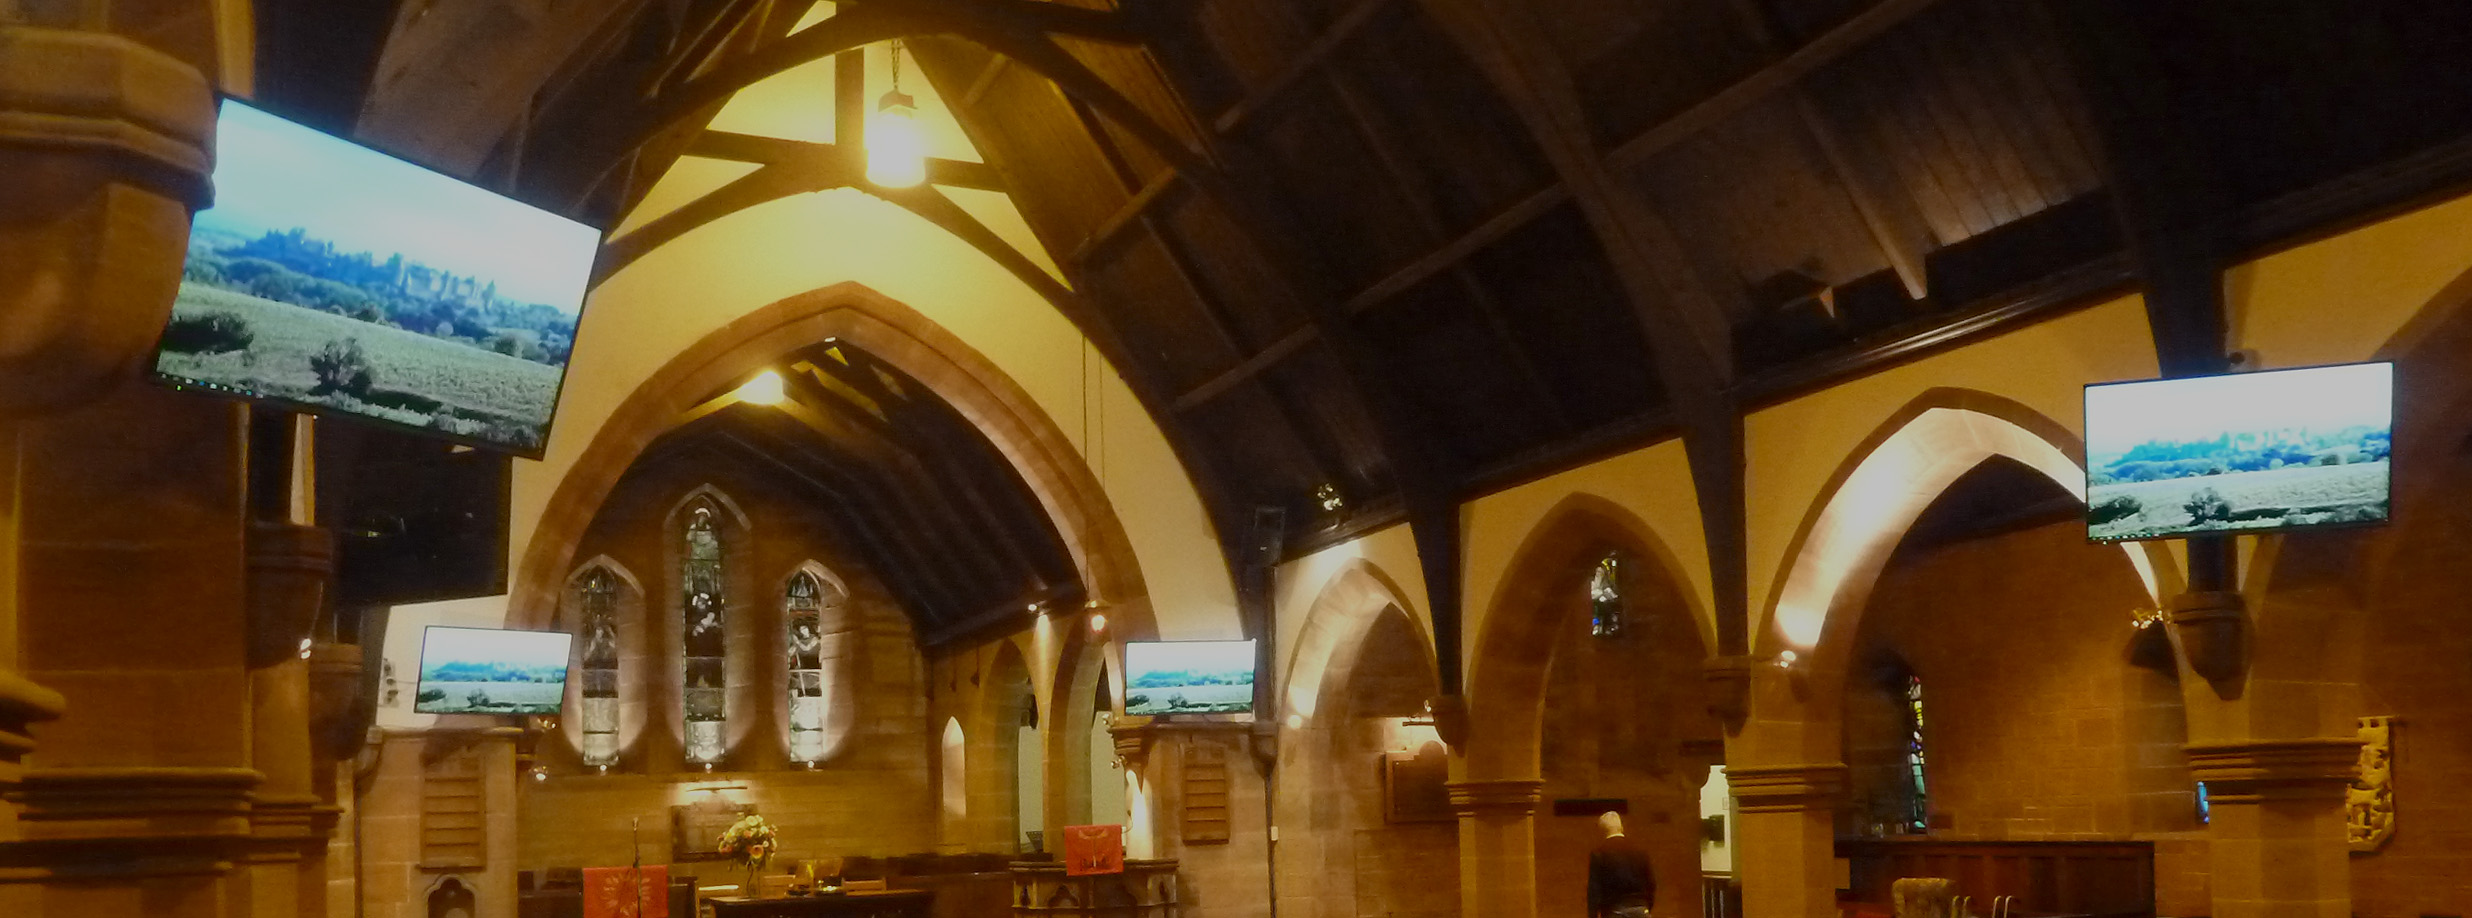 Cardonald Parish Church, Glasgow